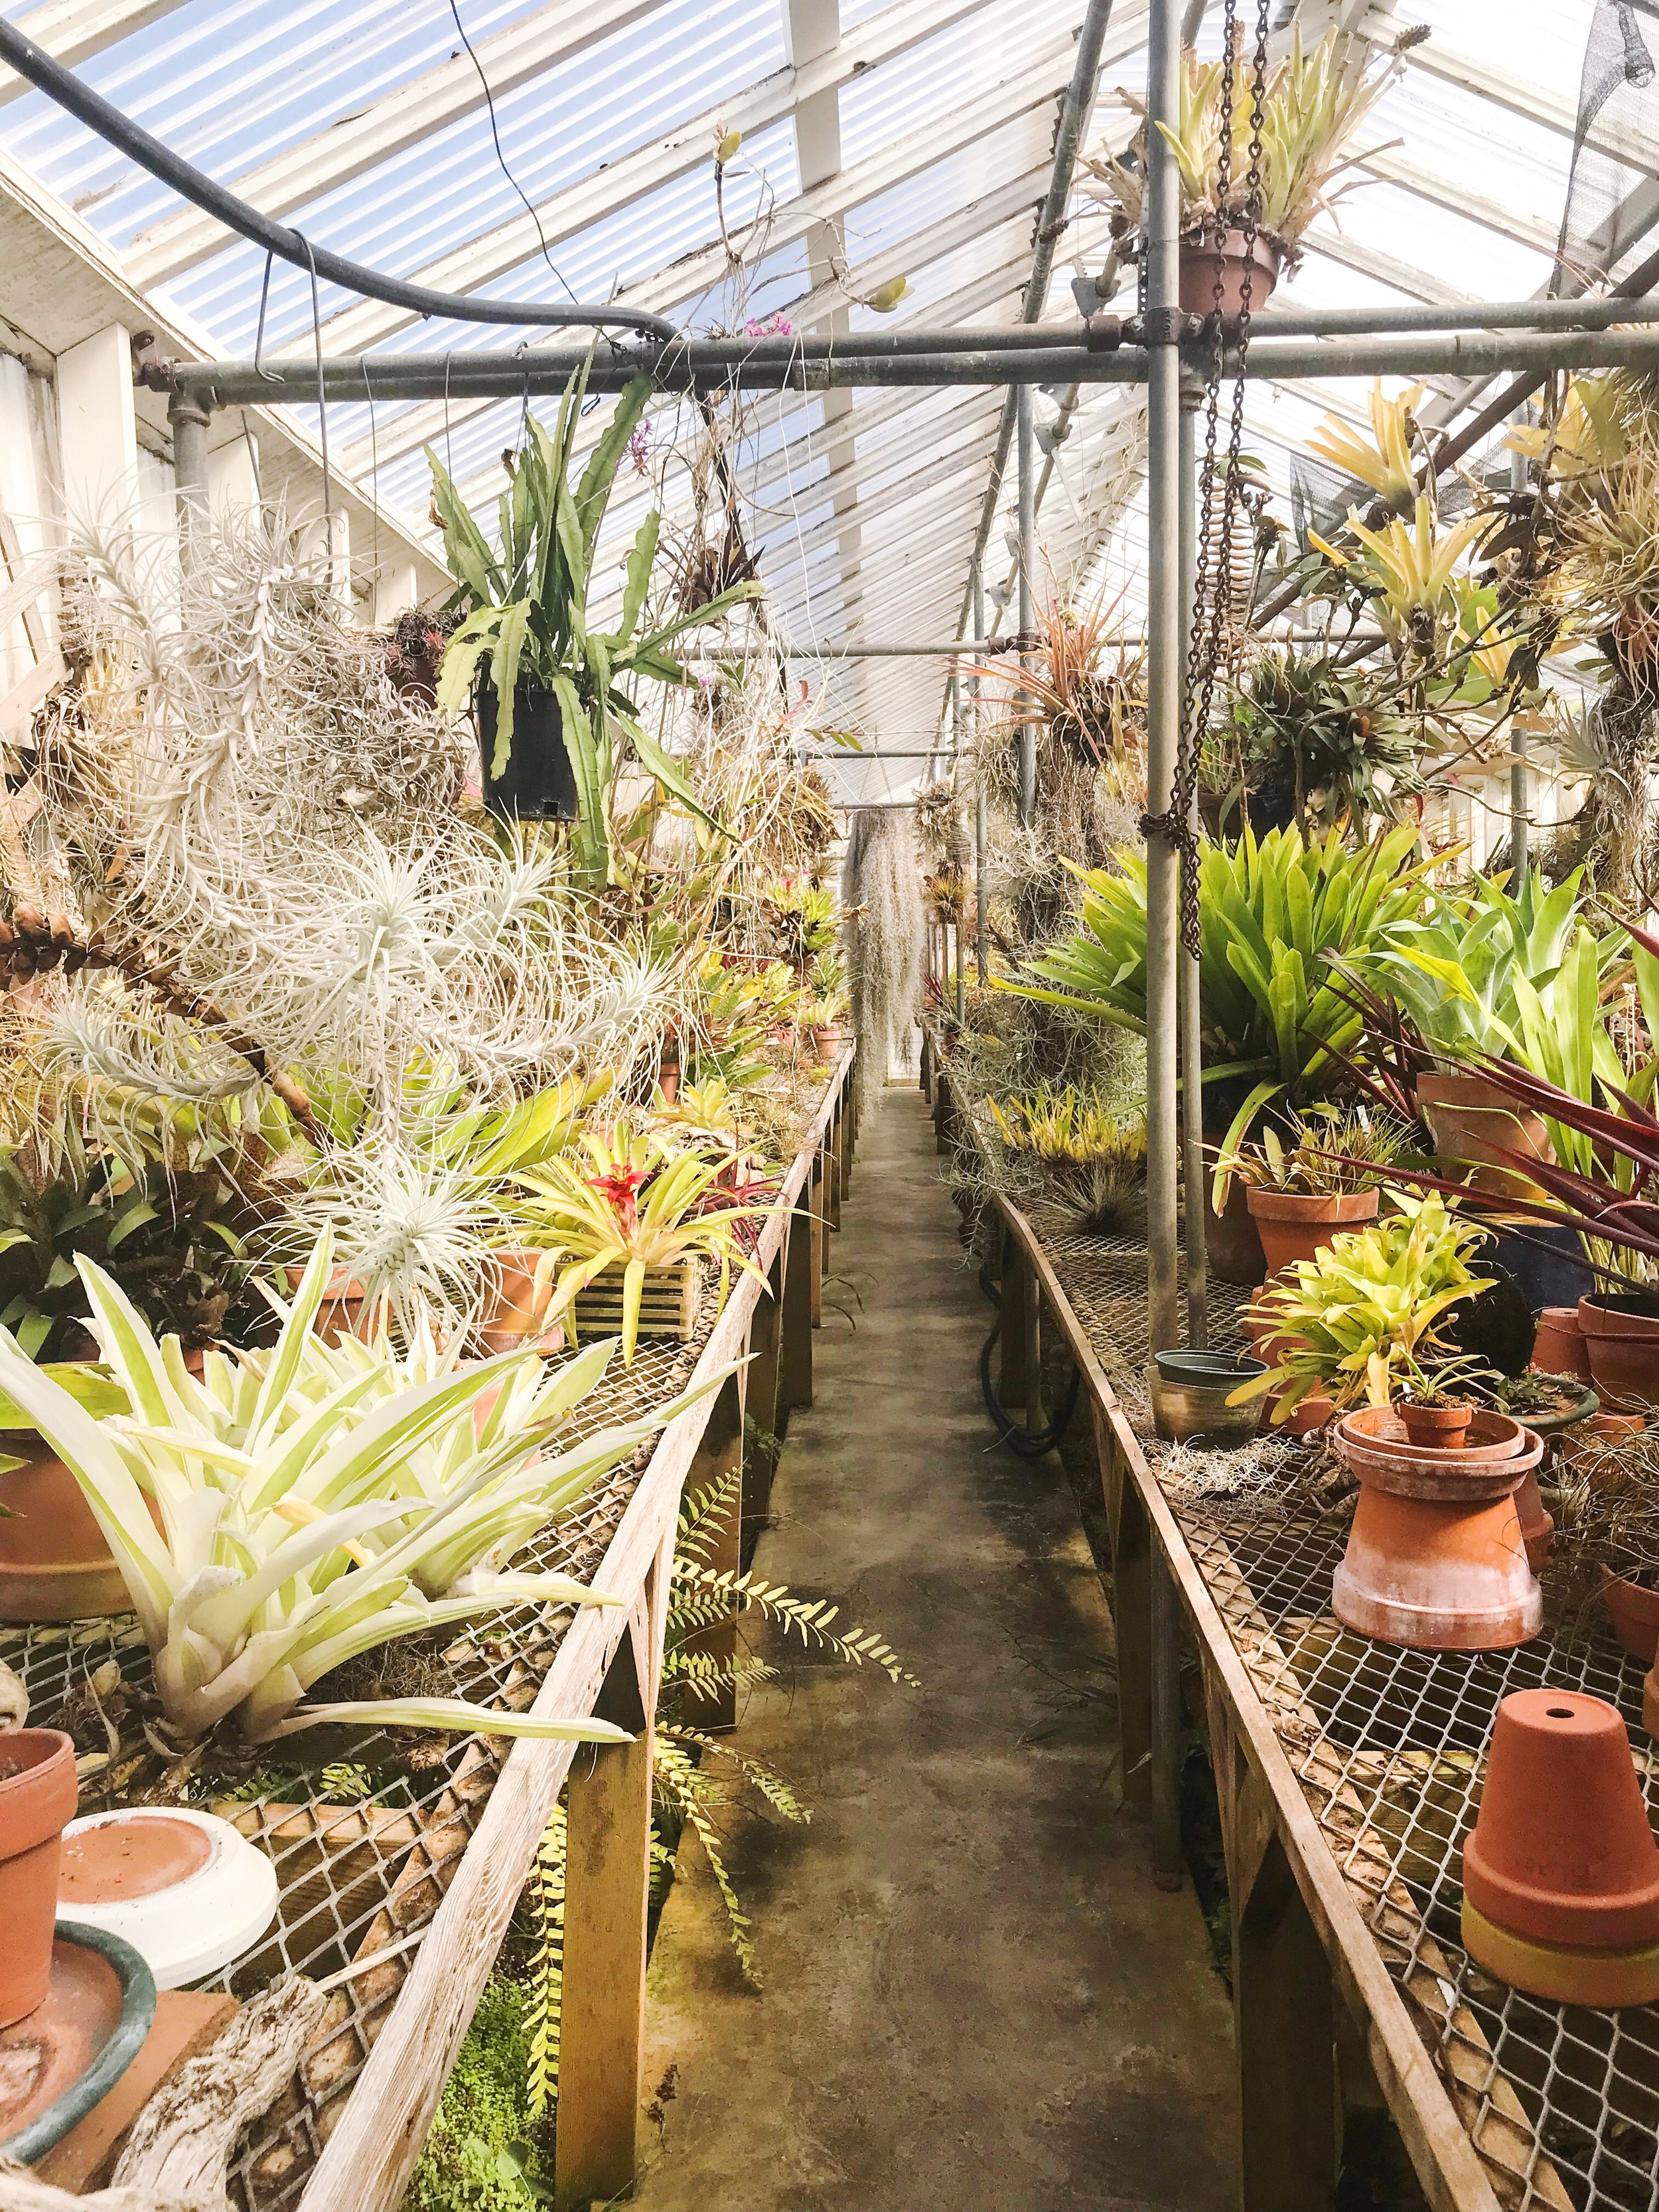 pacifica orchid farm exploration wanderlust